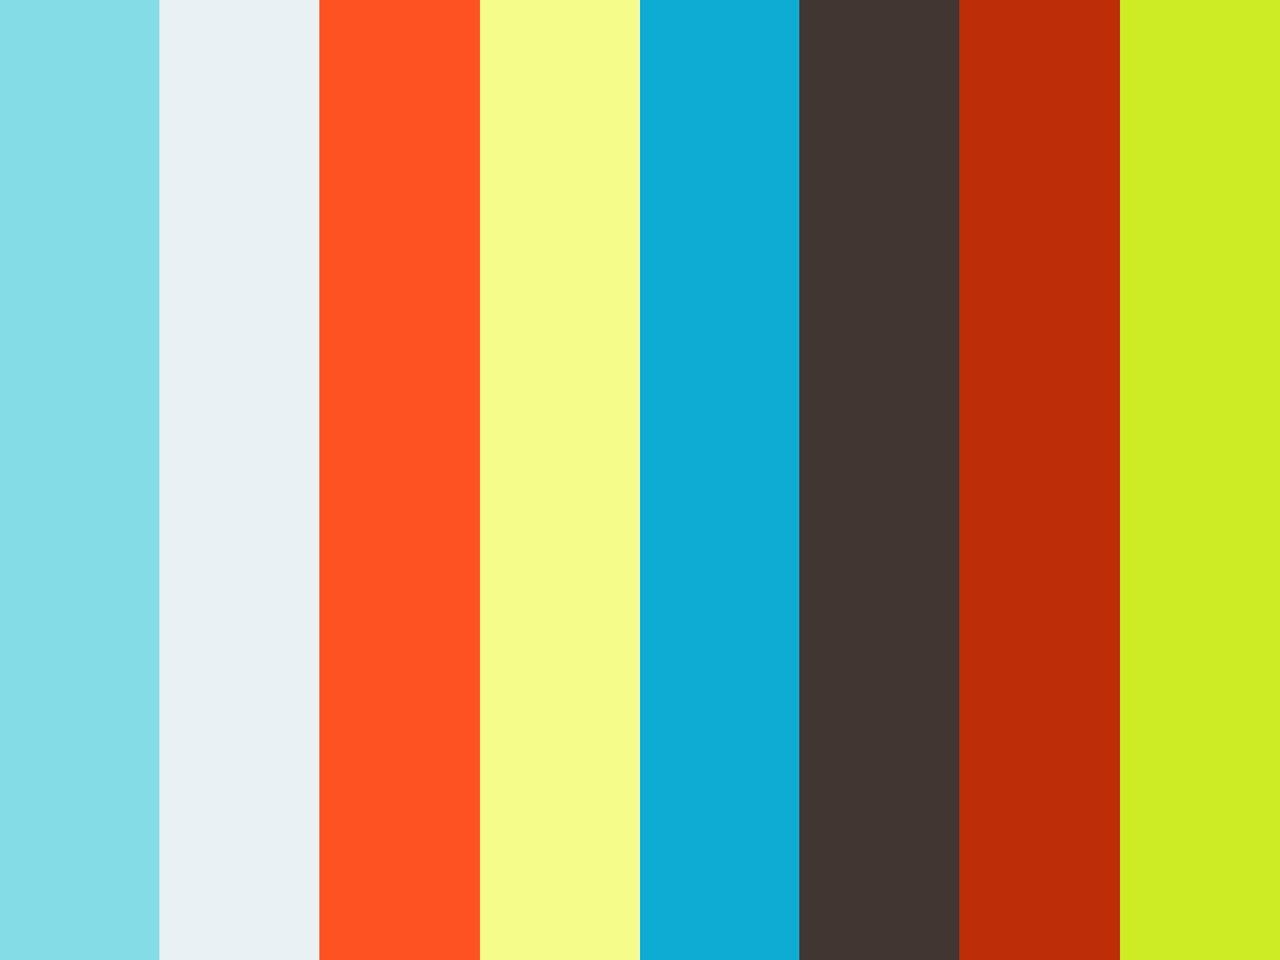 Molokai Covid19 Update - May 20, 2020